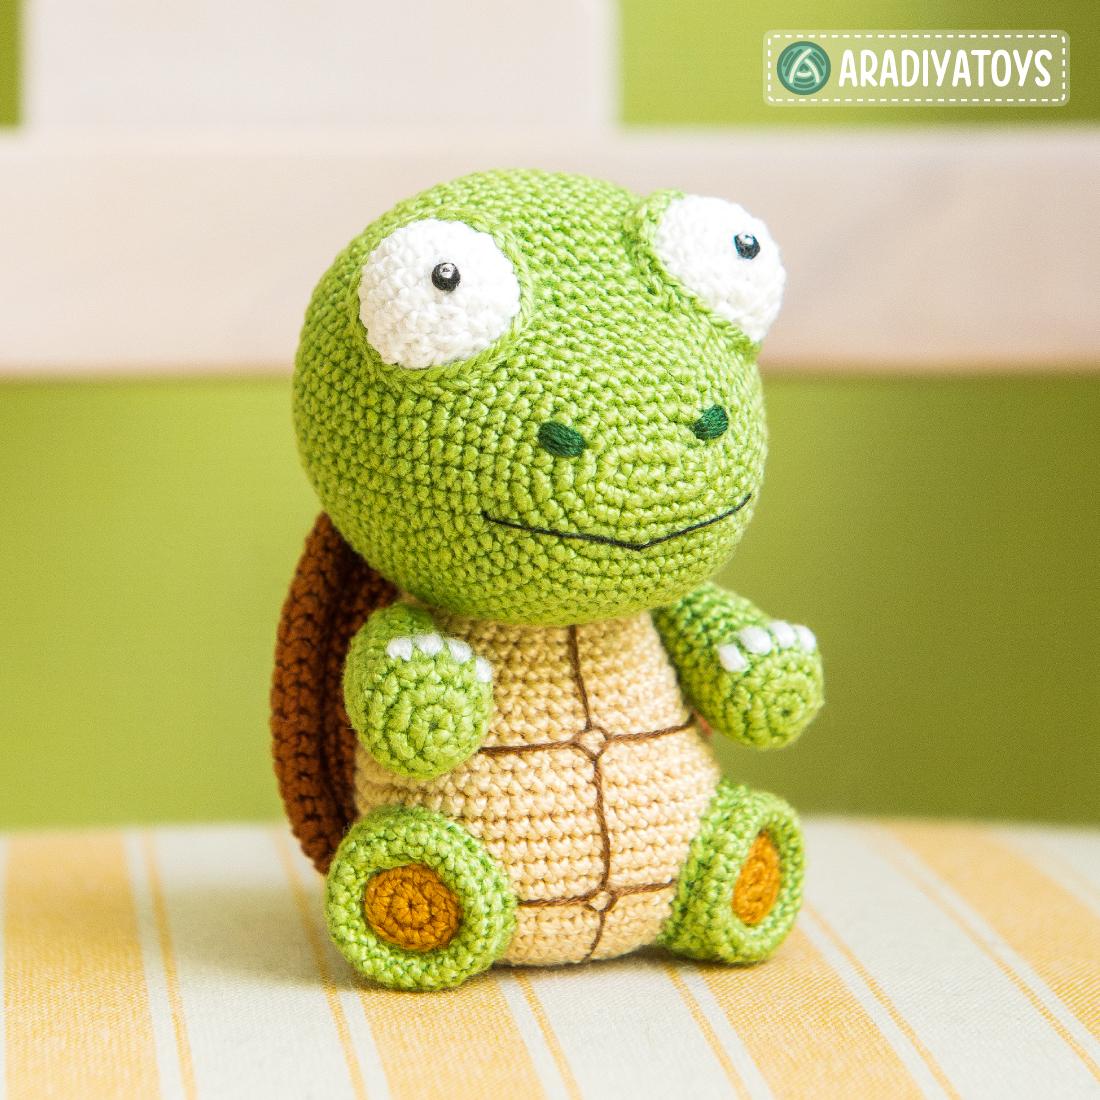 Crochet Pattern of Turtle Gina by AradiyaToys